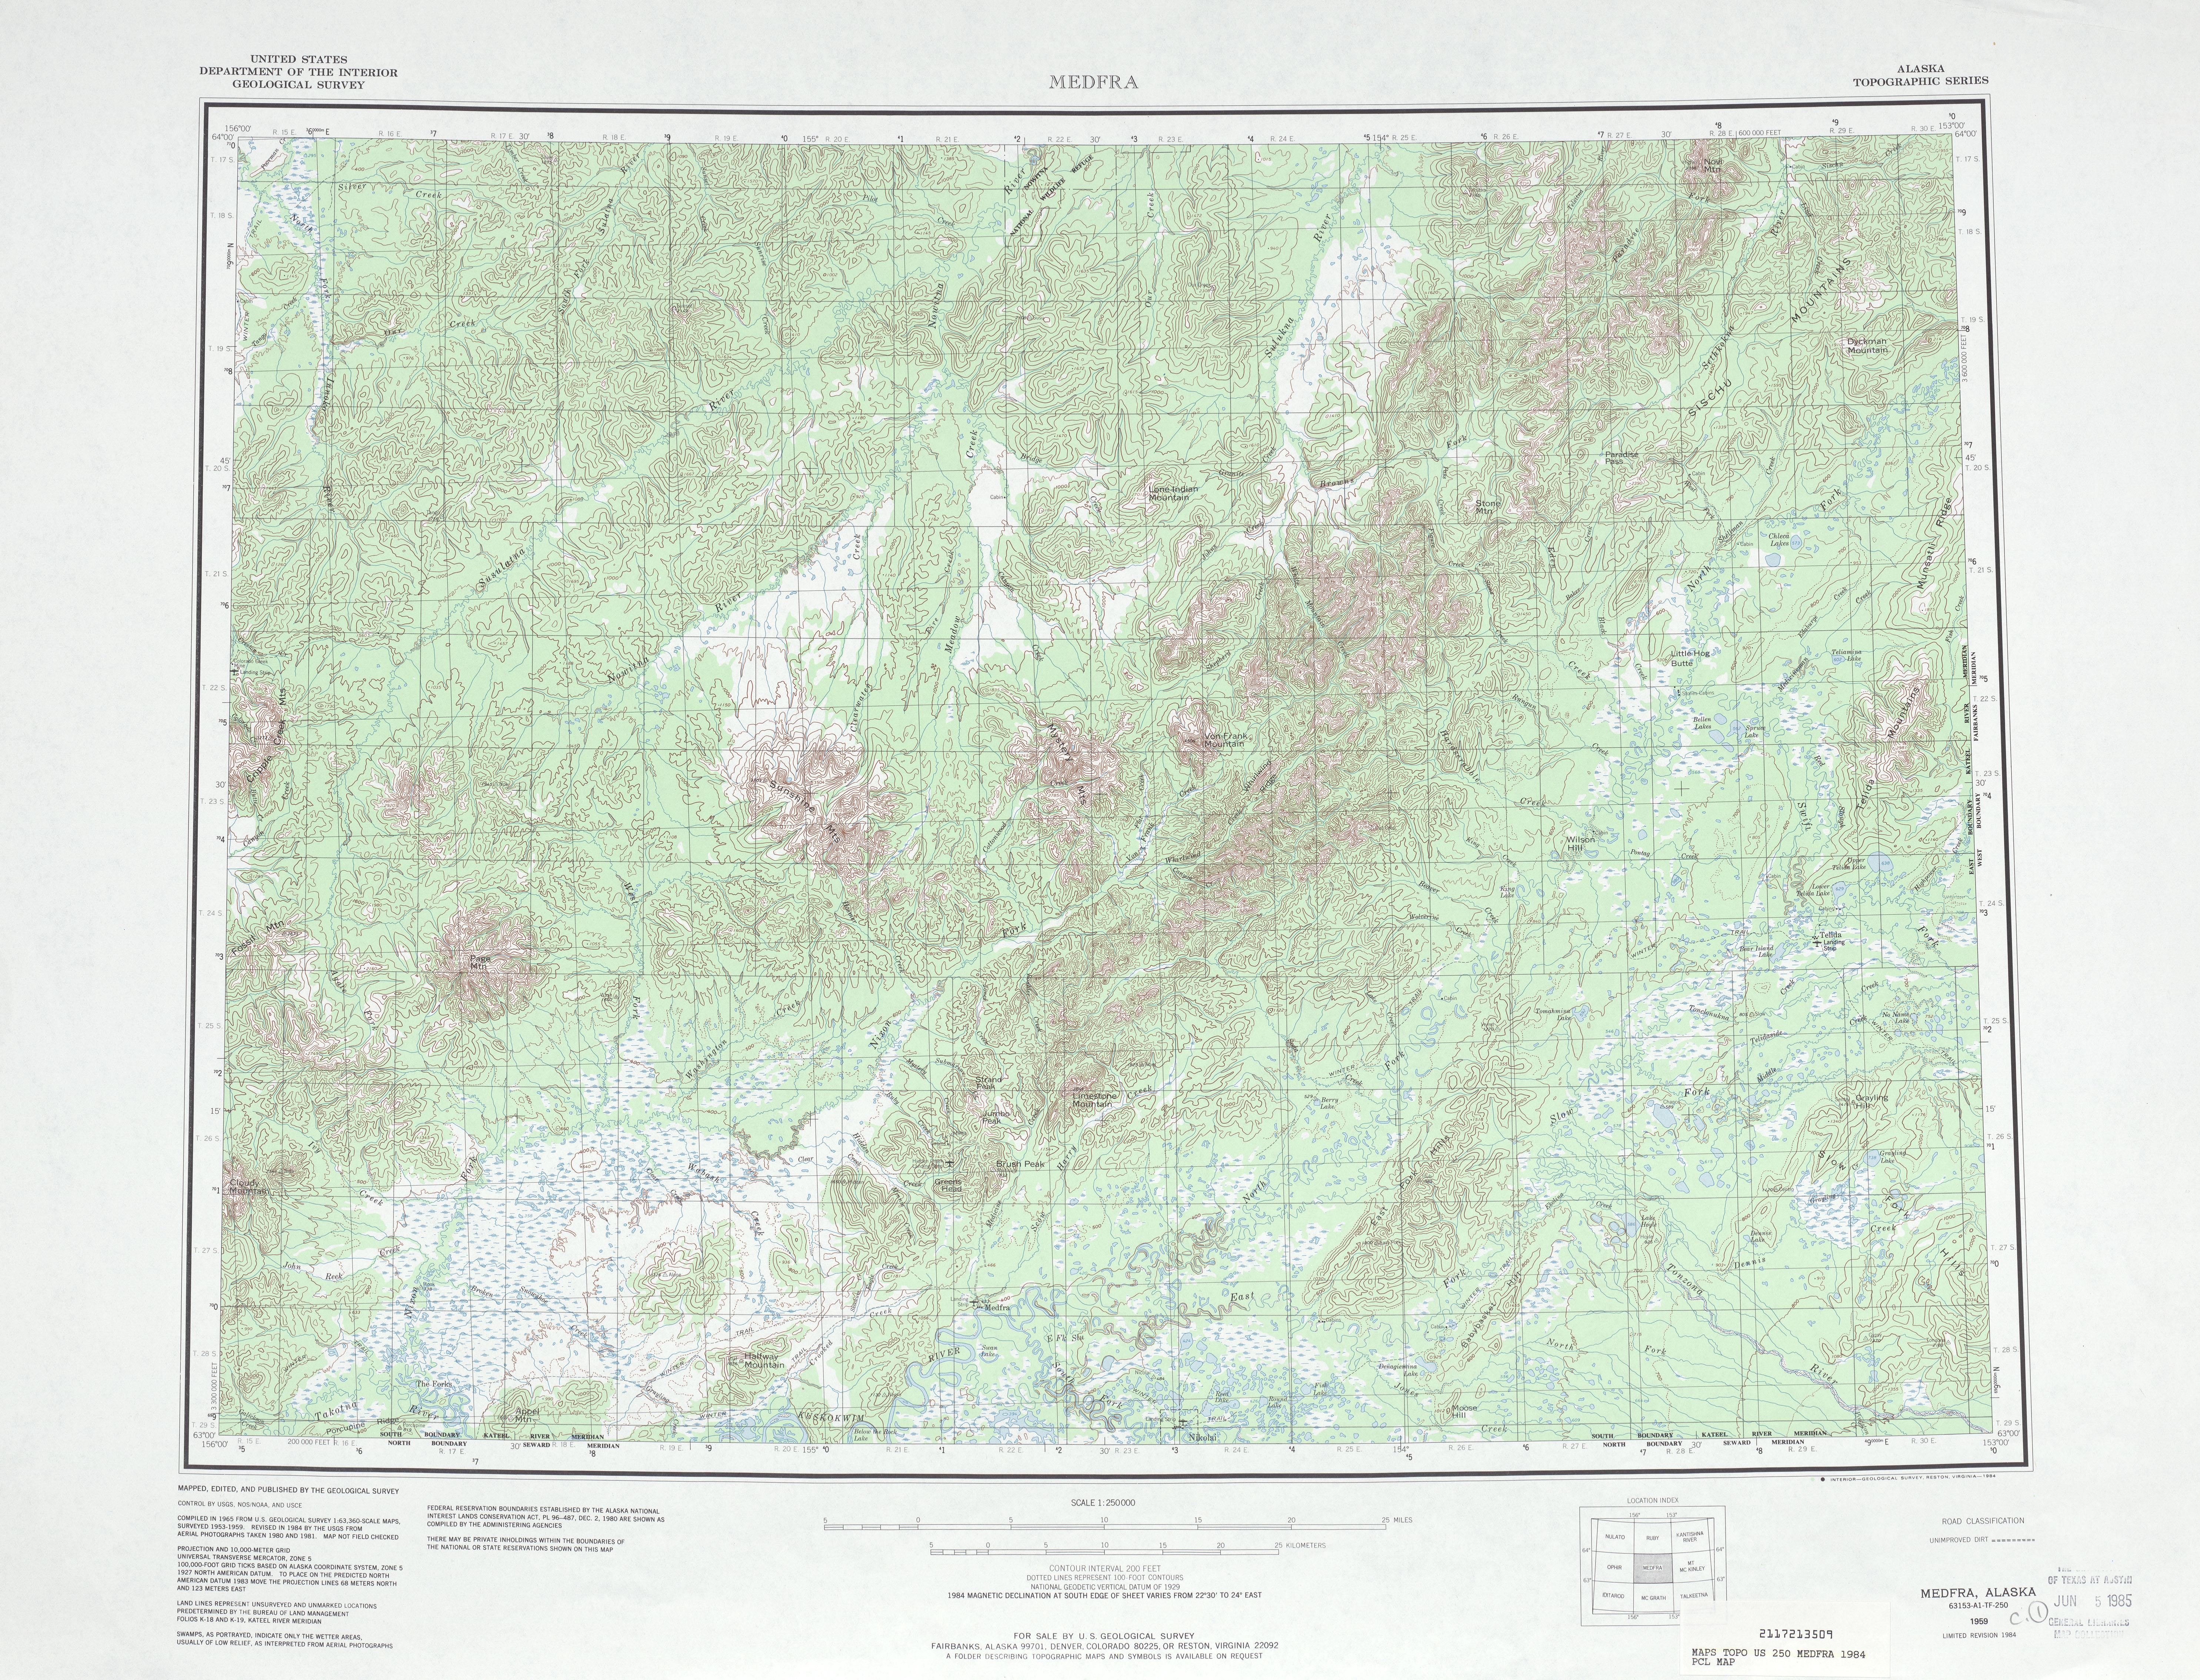 Medfra Topographic Map Sheet, United States 1984